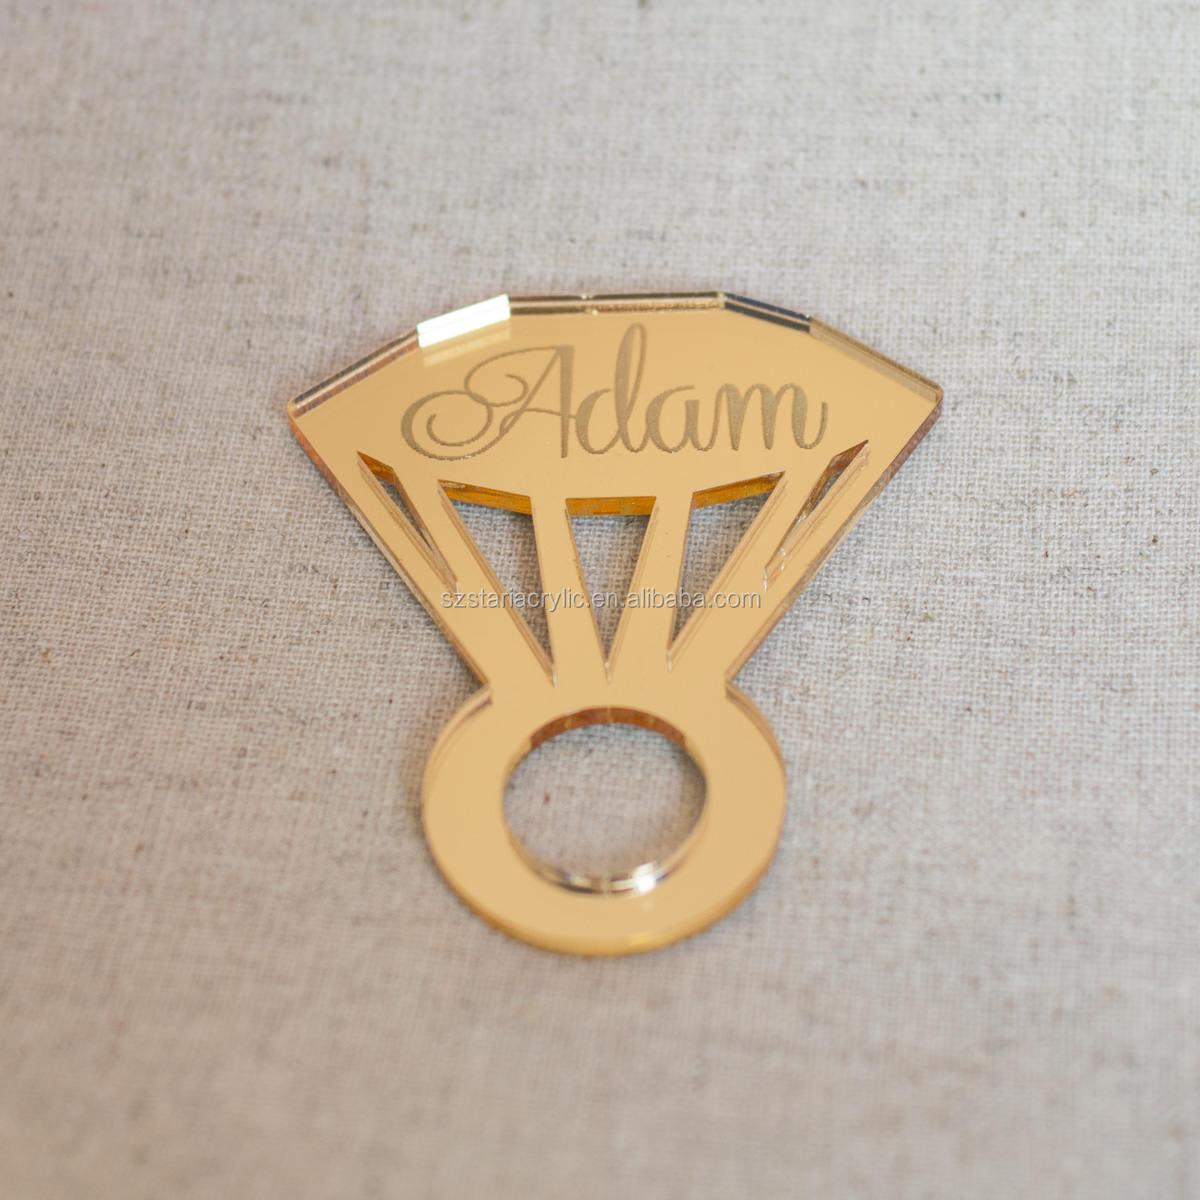 Diamond Shaped Mirror Acrylic Napkin Ring Personalized Engraving Name